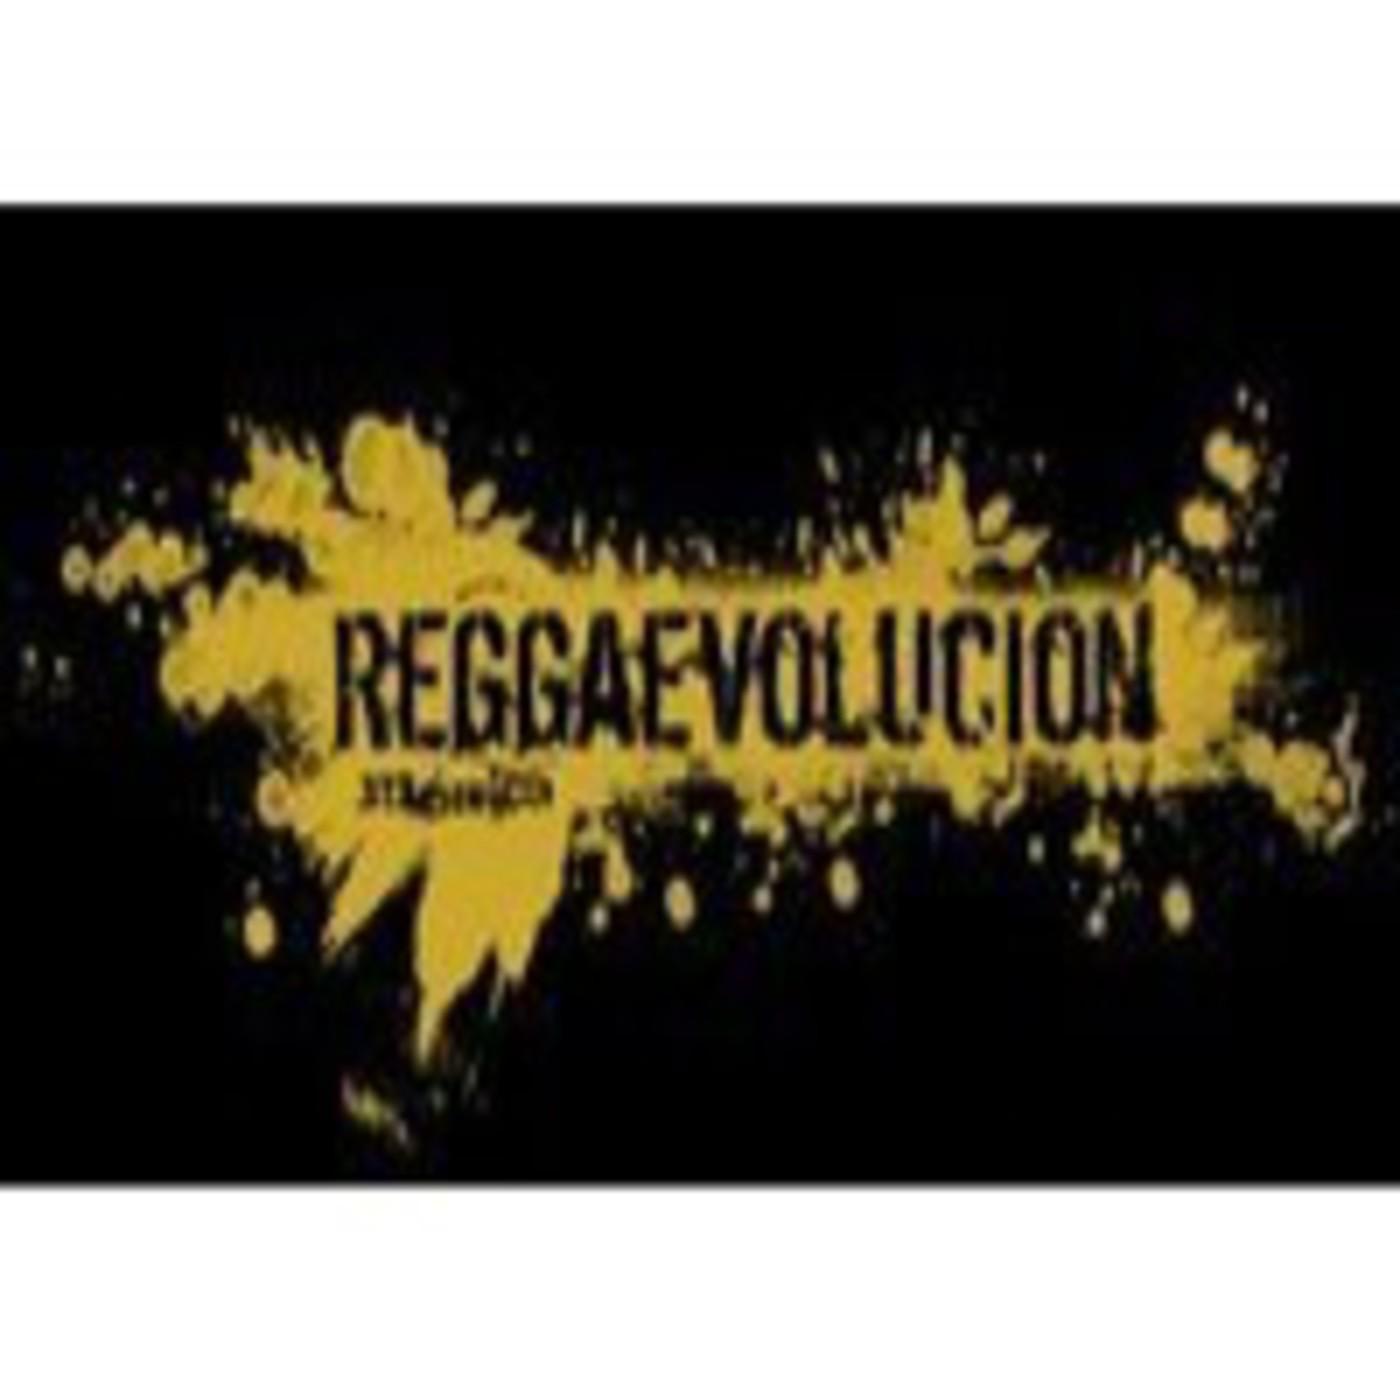 Reggaevolucion online dating